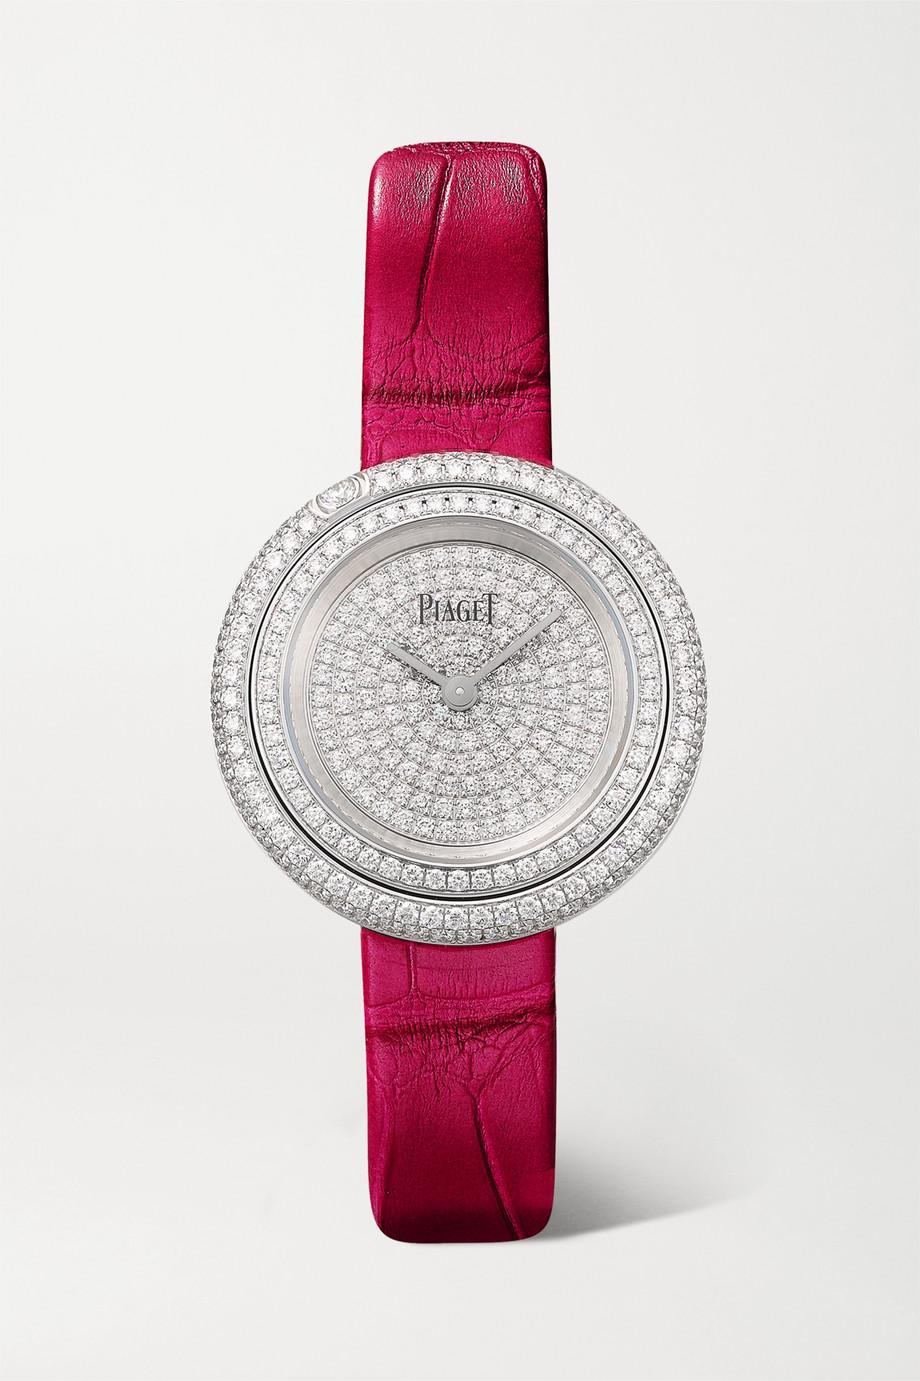 Piaget Possession 29mm 18-karat white gold, alligator and diamond watch